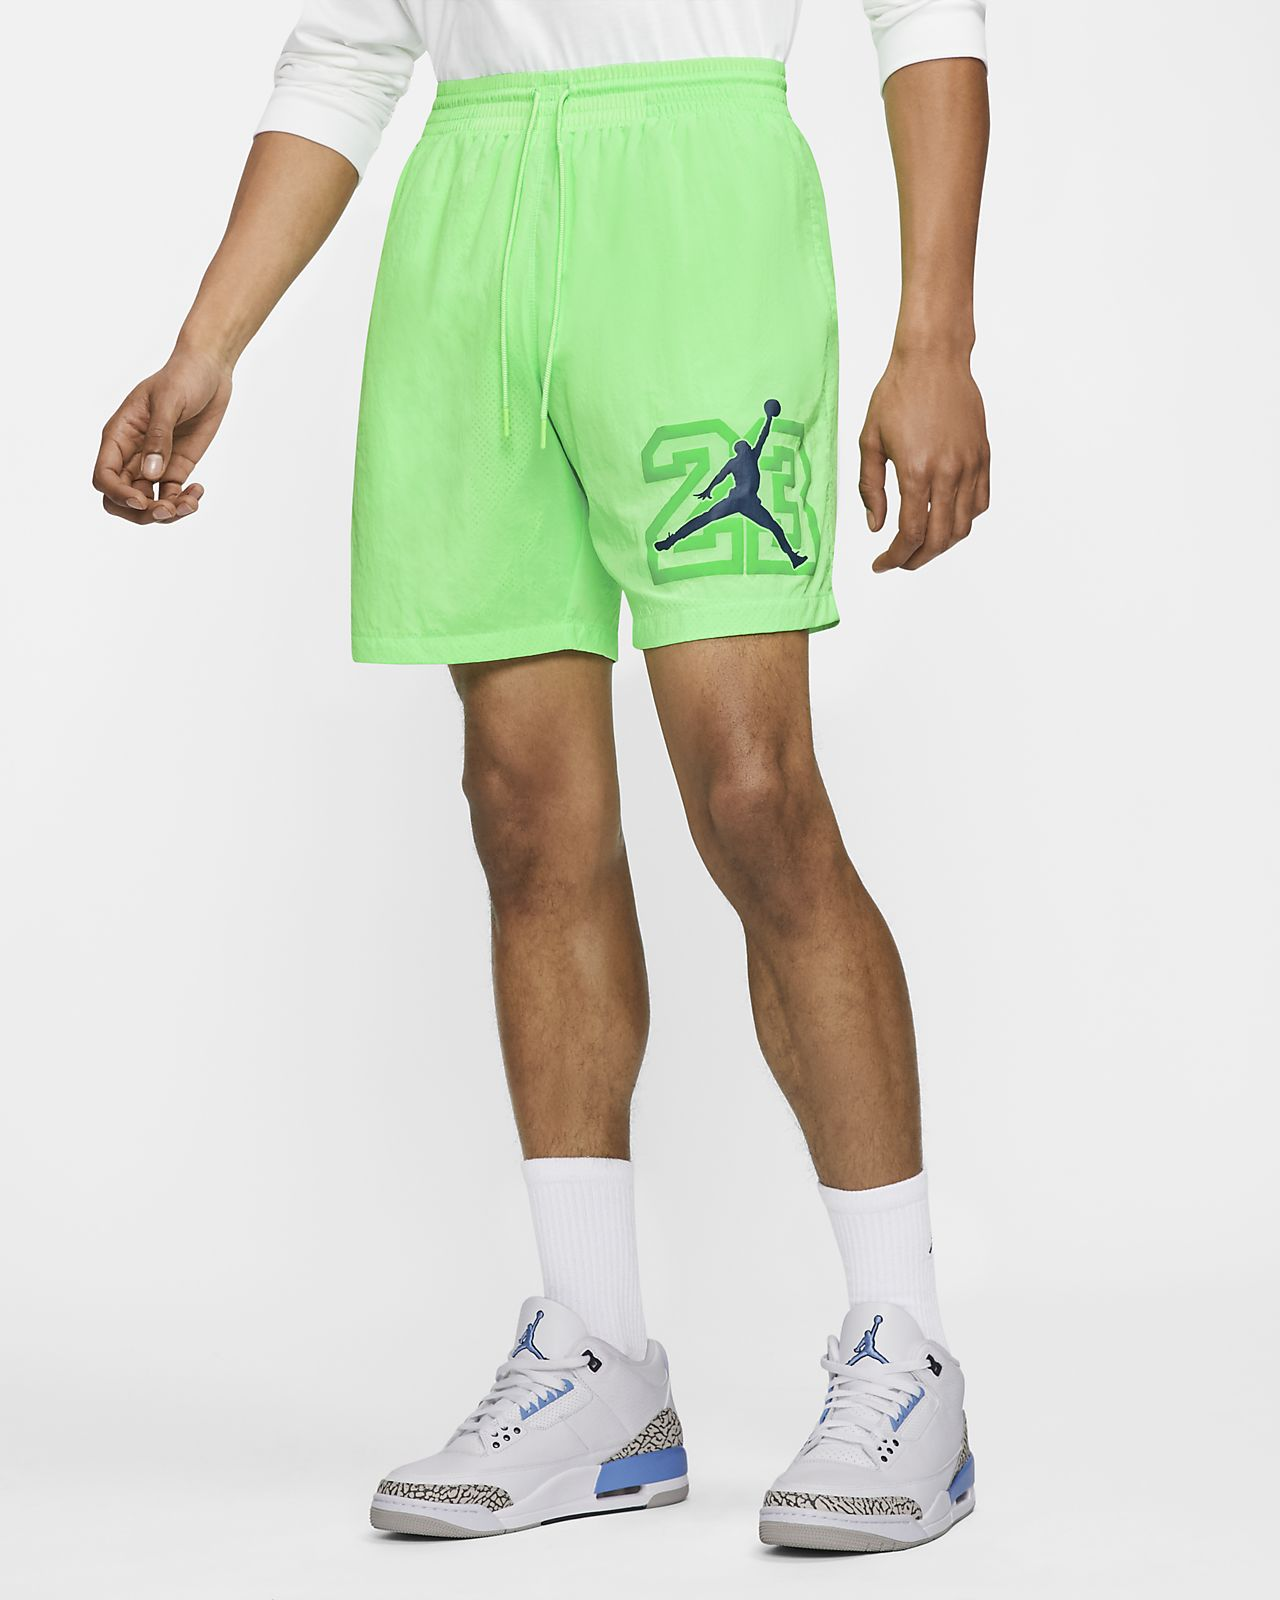 Jordan Legacy AJ13 Poolside Men's Shorts